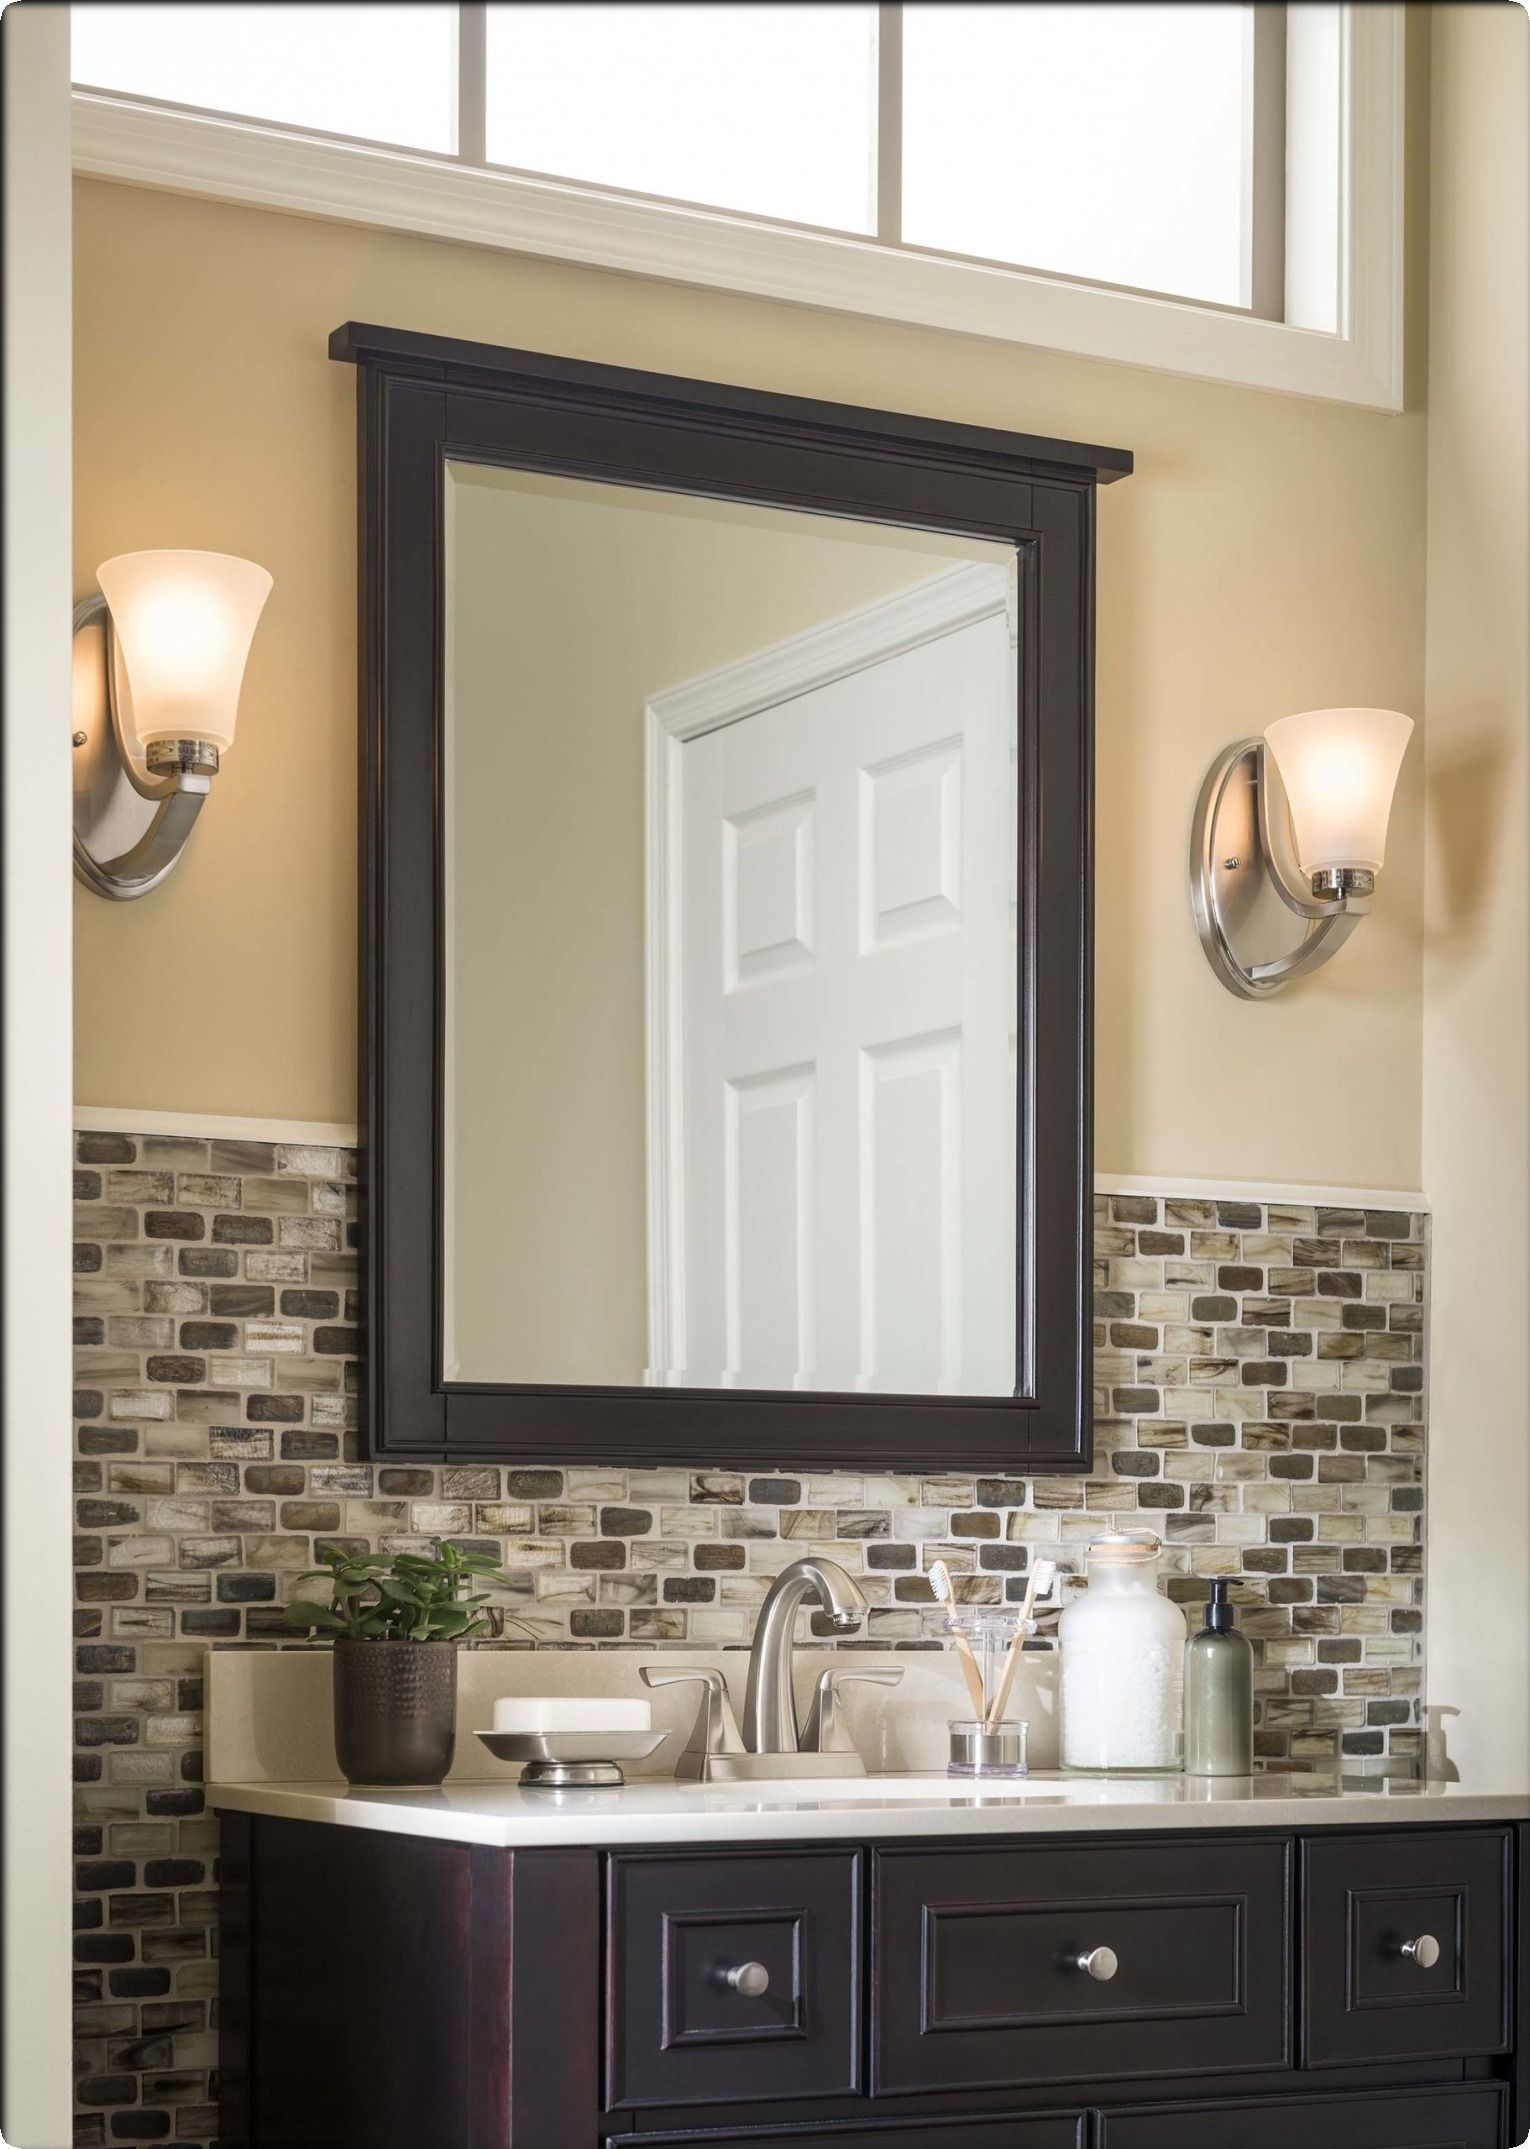 Bathroom bathroomdesign BathroomDecor bathroomremodel